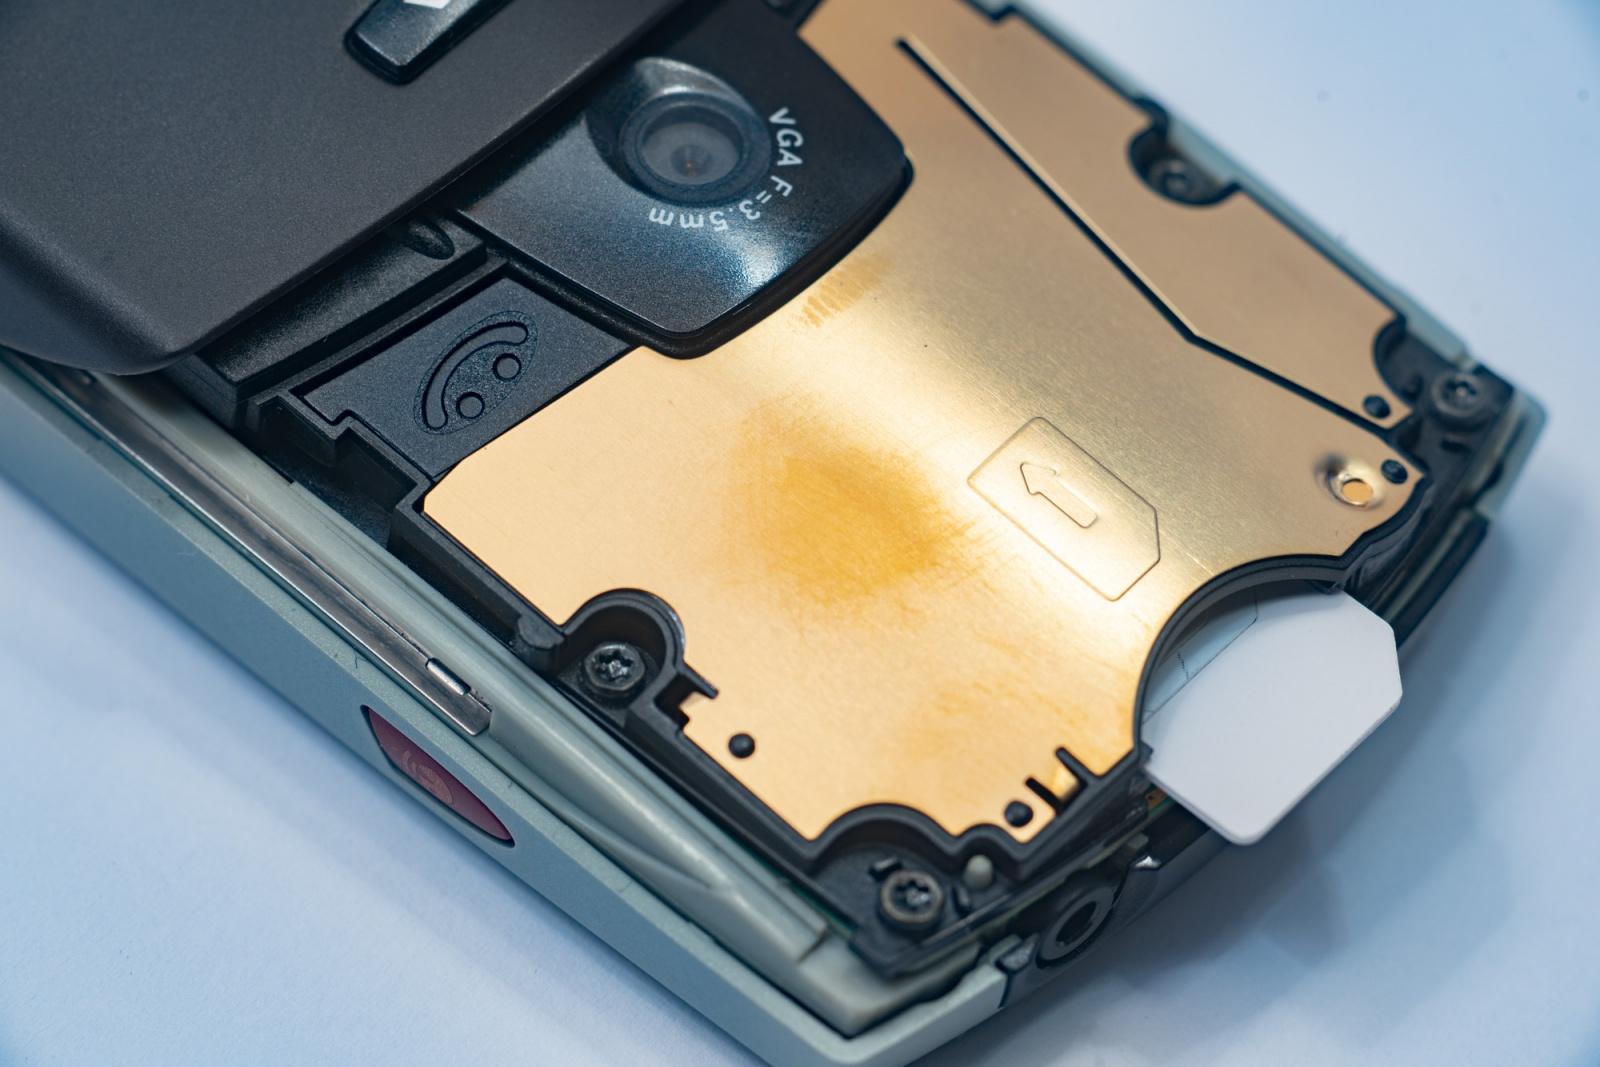 Nokia 7650 и начало эпохи смартфонов - 17